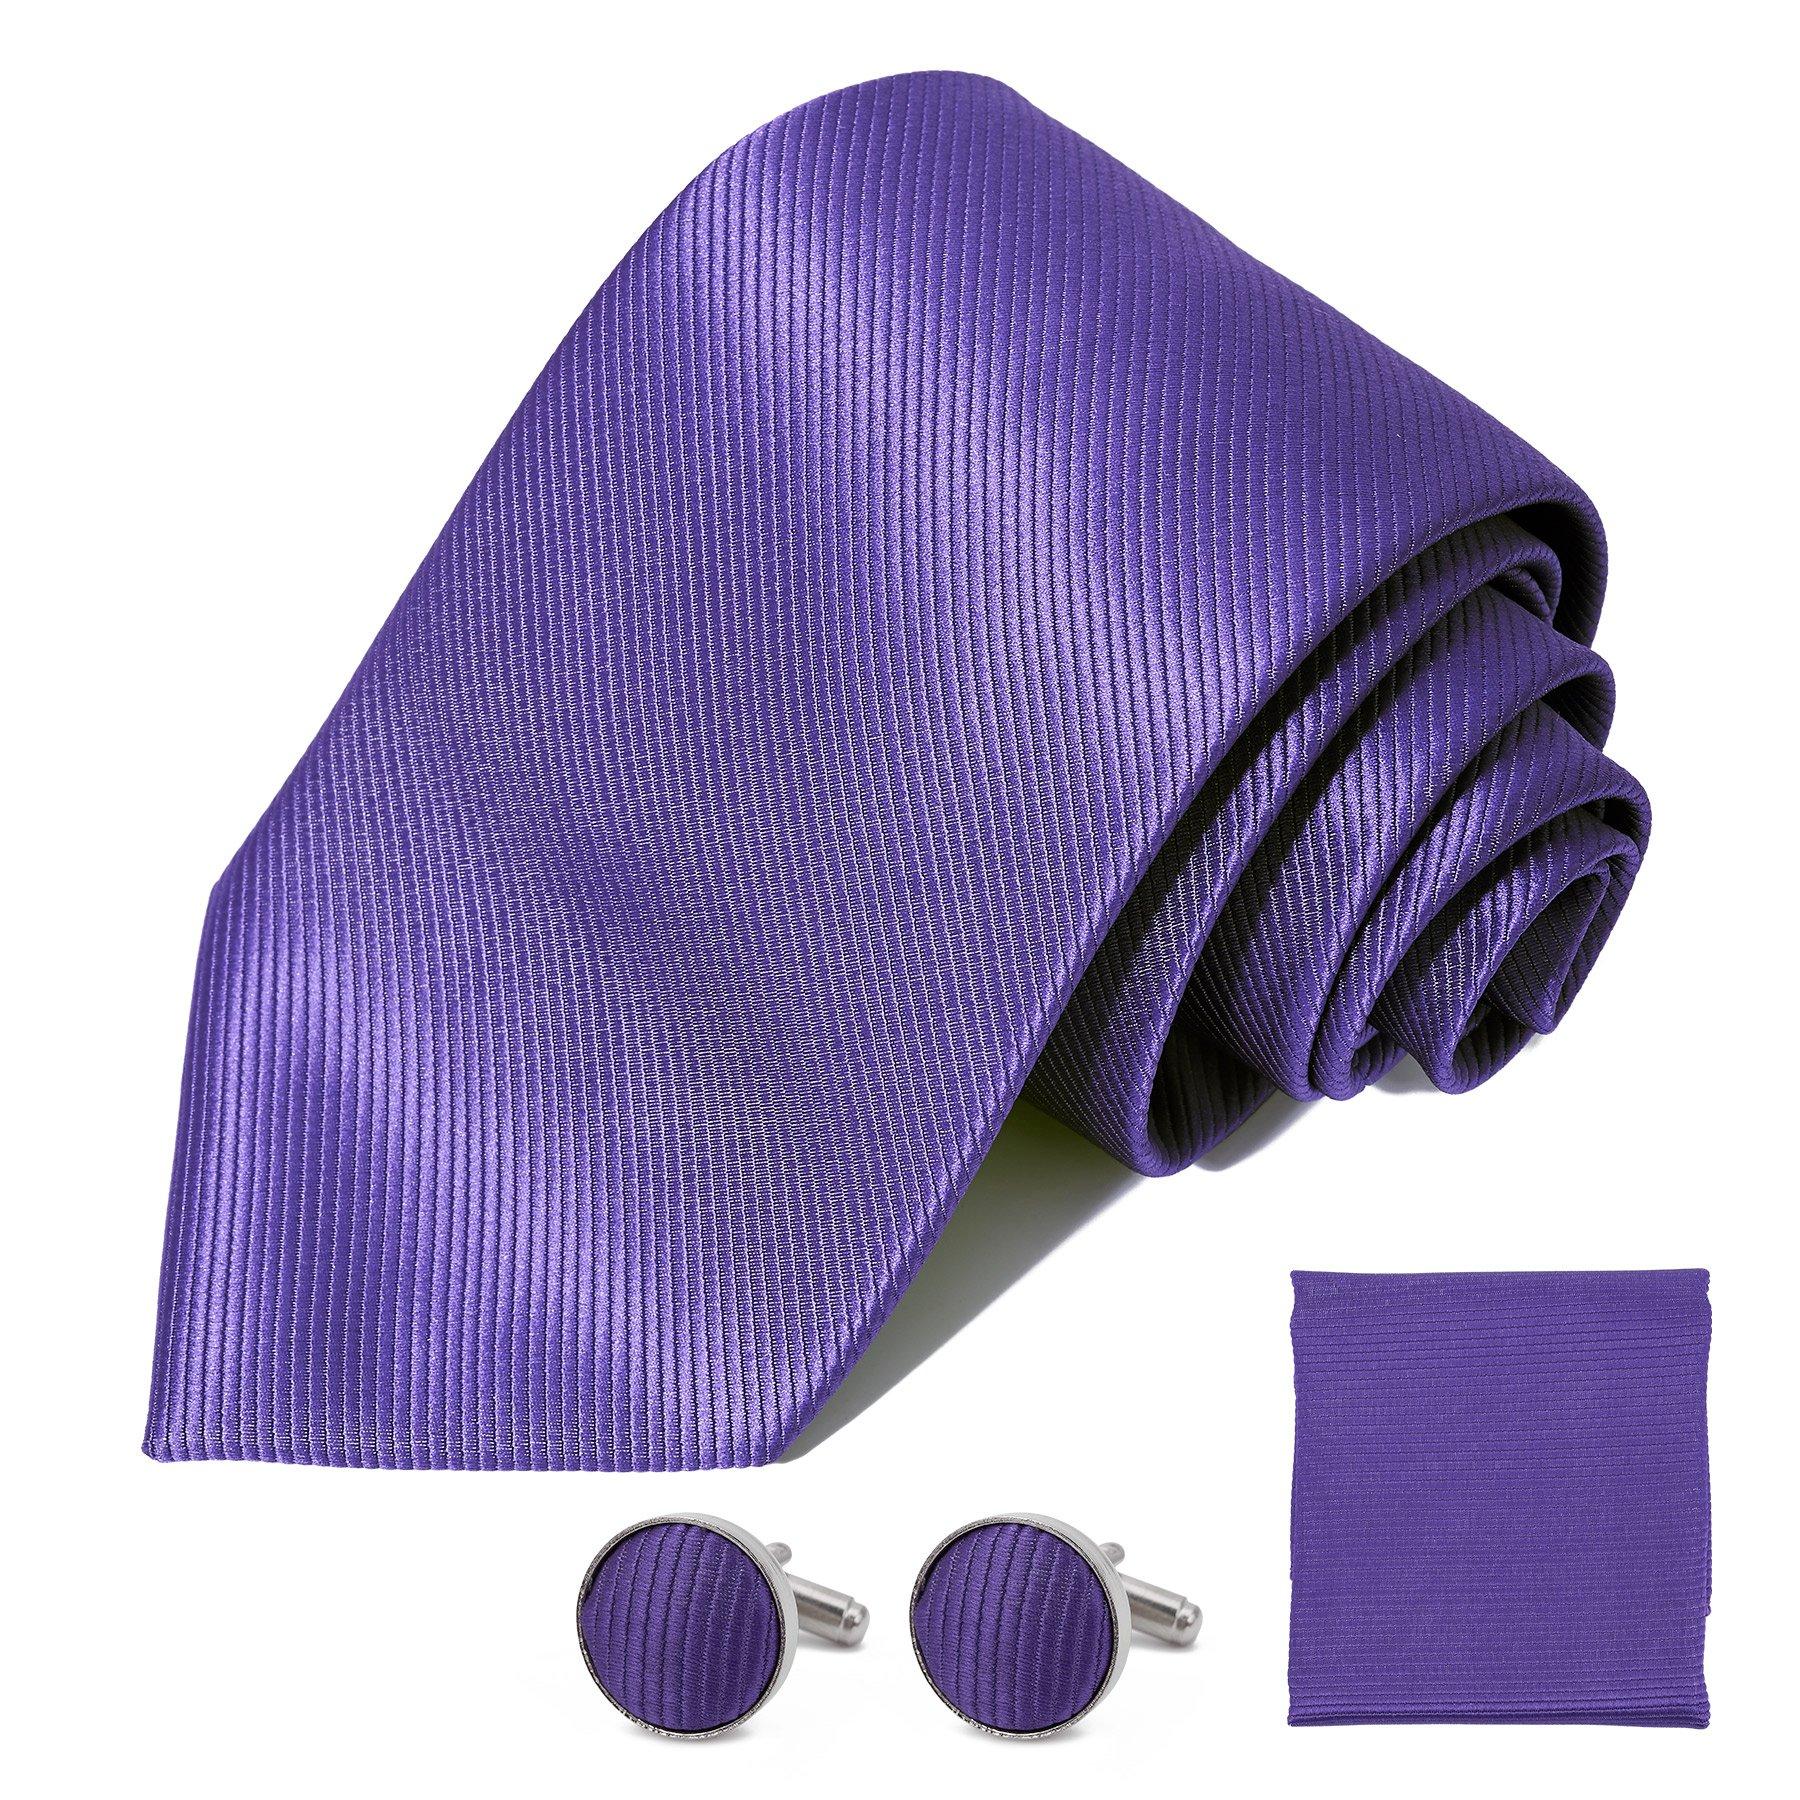 DEVPSISR Solid Satin Wide Tie Pocket Square Cufflinks Men Neckties Suit Accessories Formal set For Men (Purple)